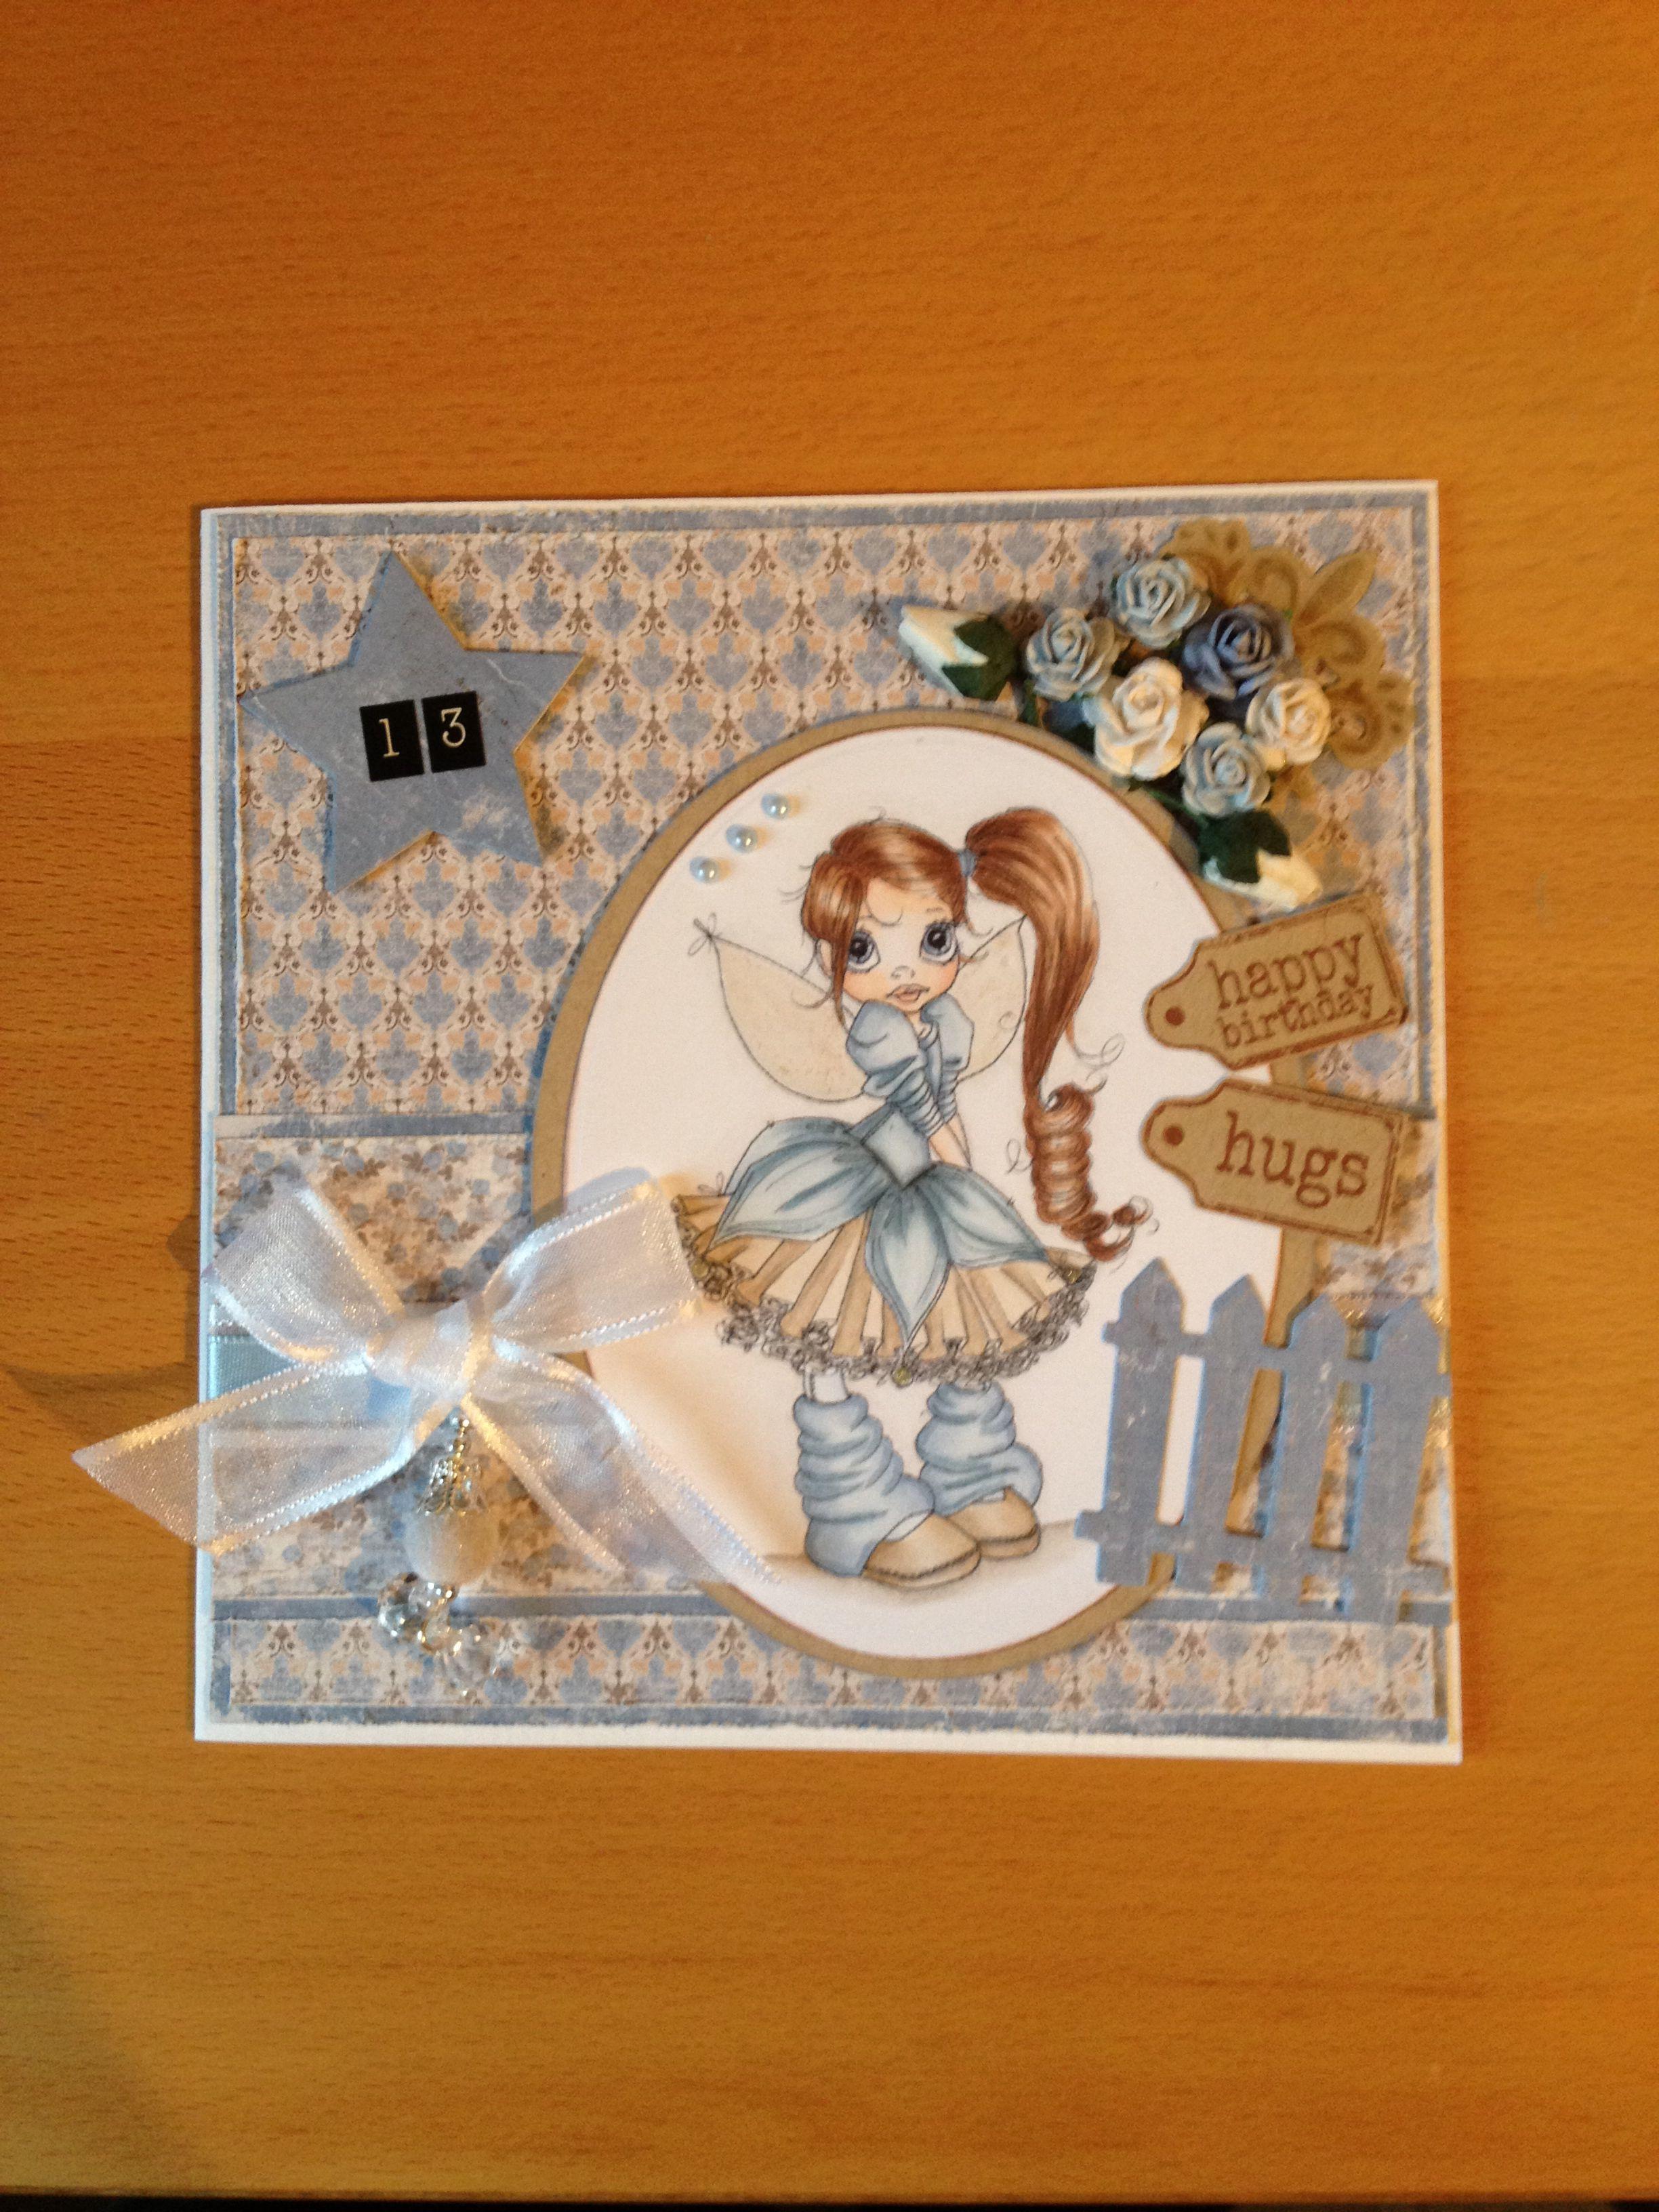 Birthday card girl 13 years old